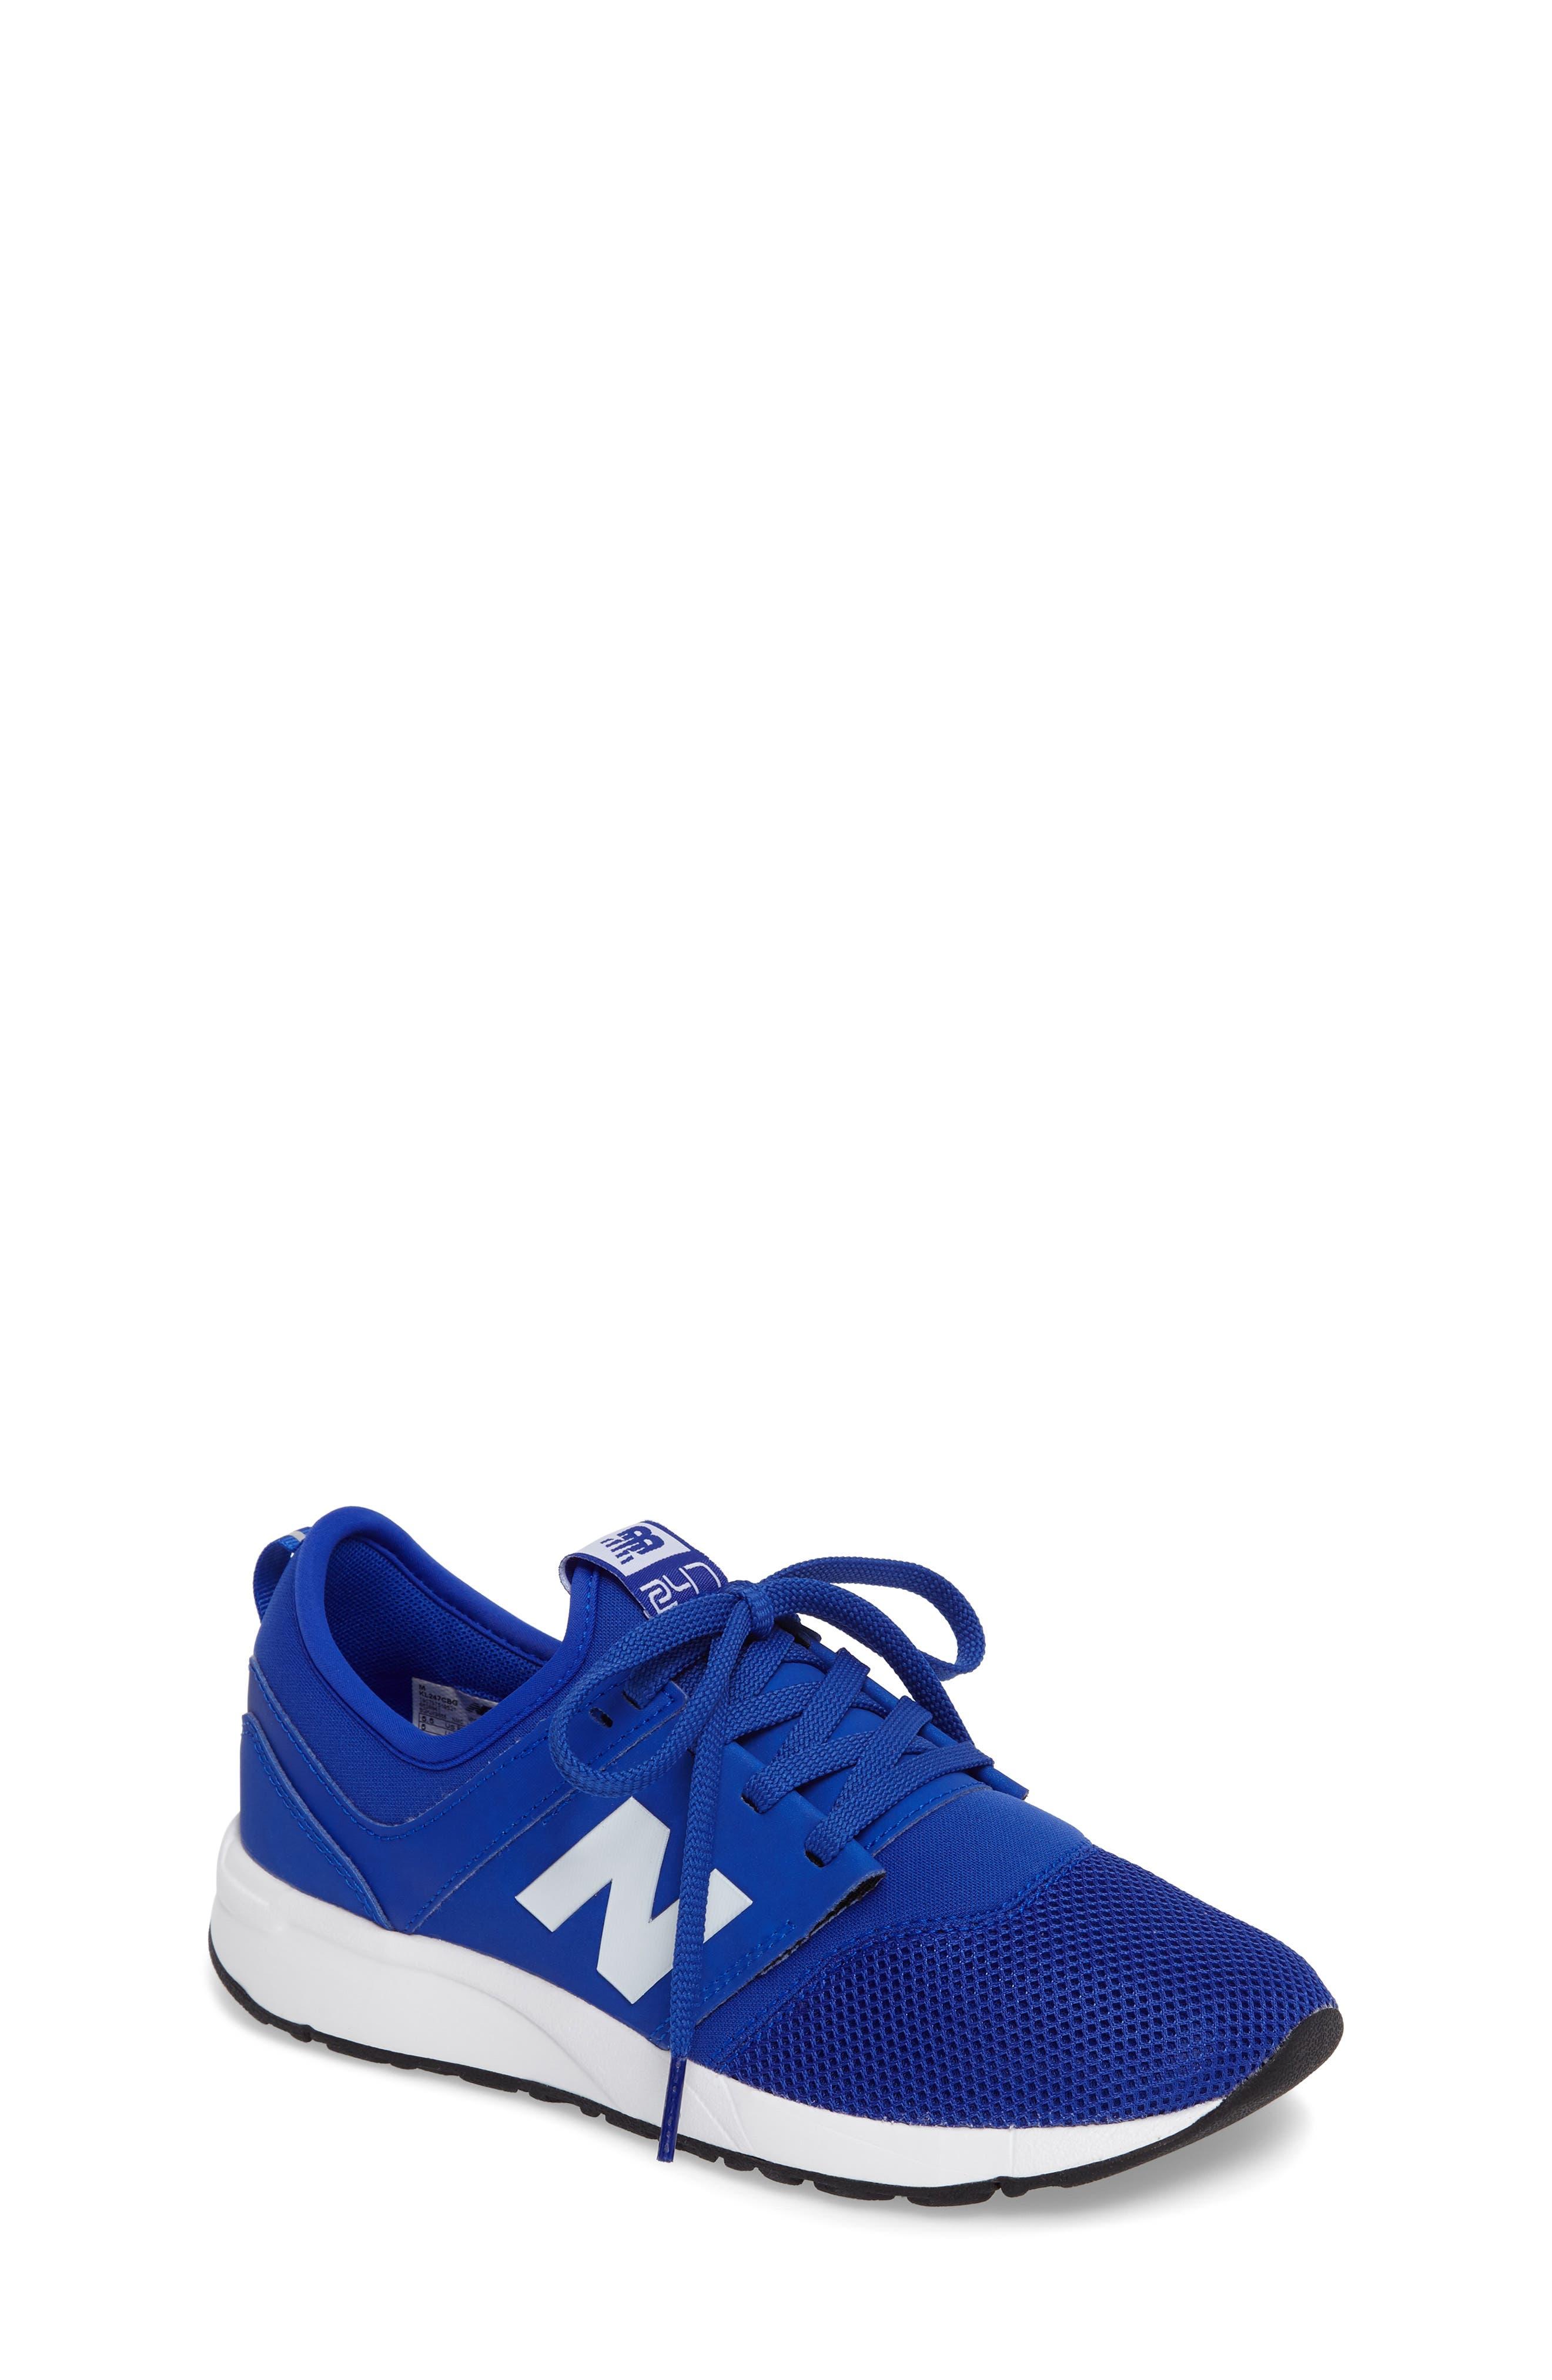 Main Image - New Balance 247 Core Sneaker (Big Kid)